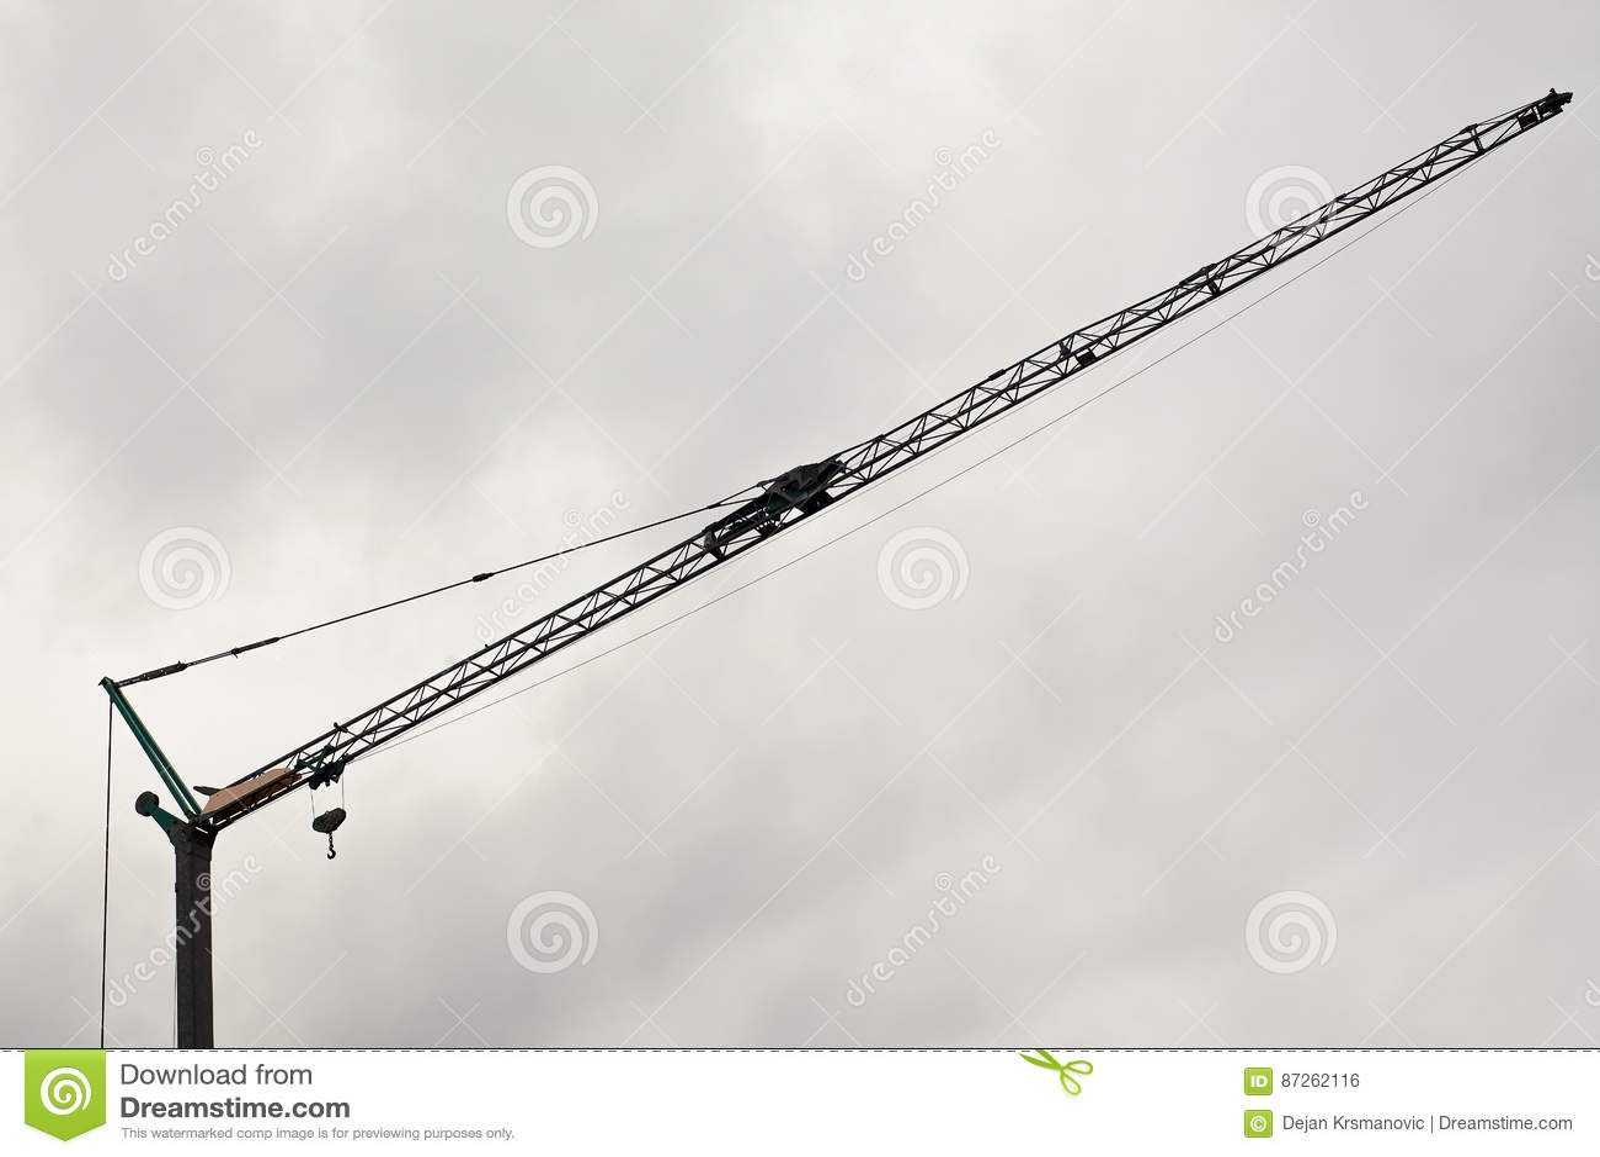 Crane Details and Cloudy Sky